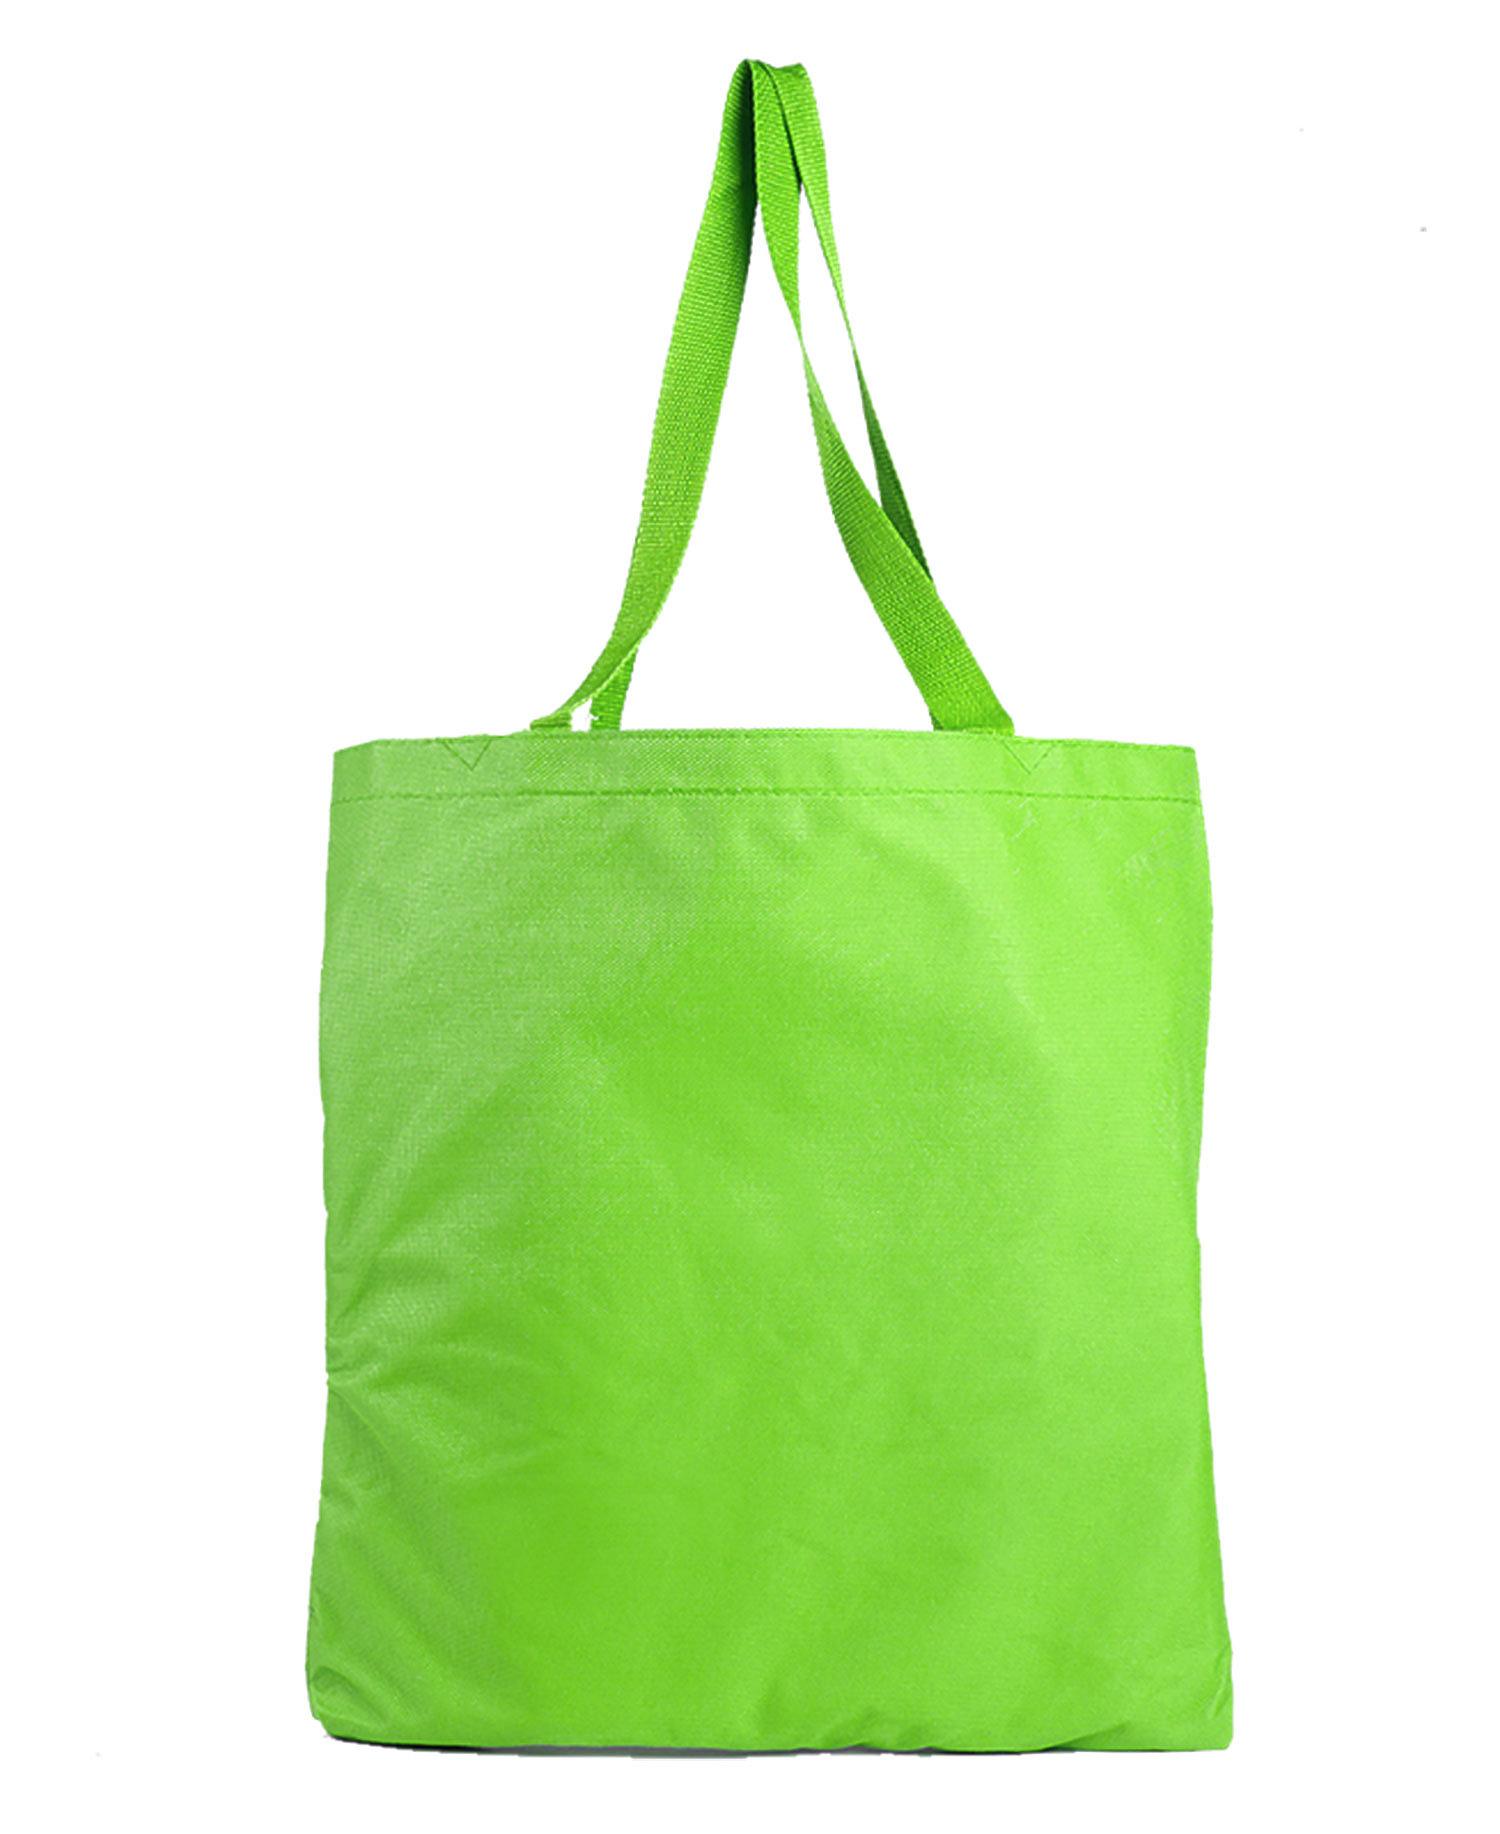 Q-Tees Q91284 - Polyester Tote Bag